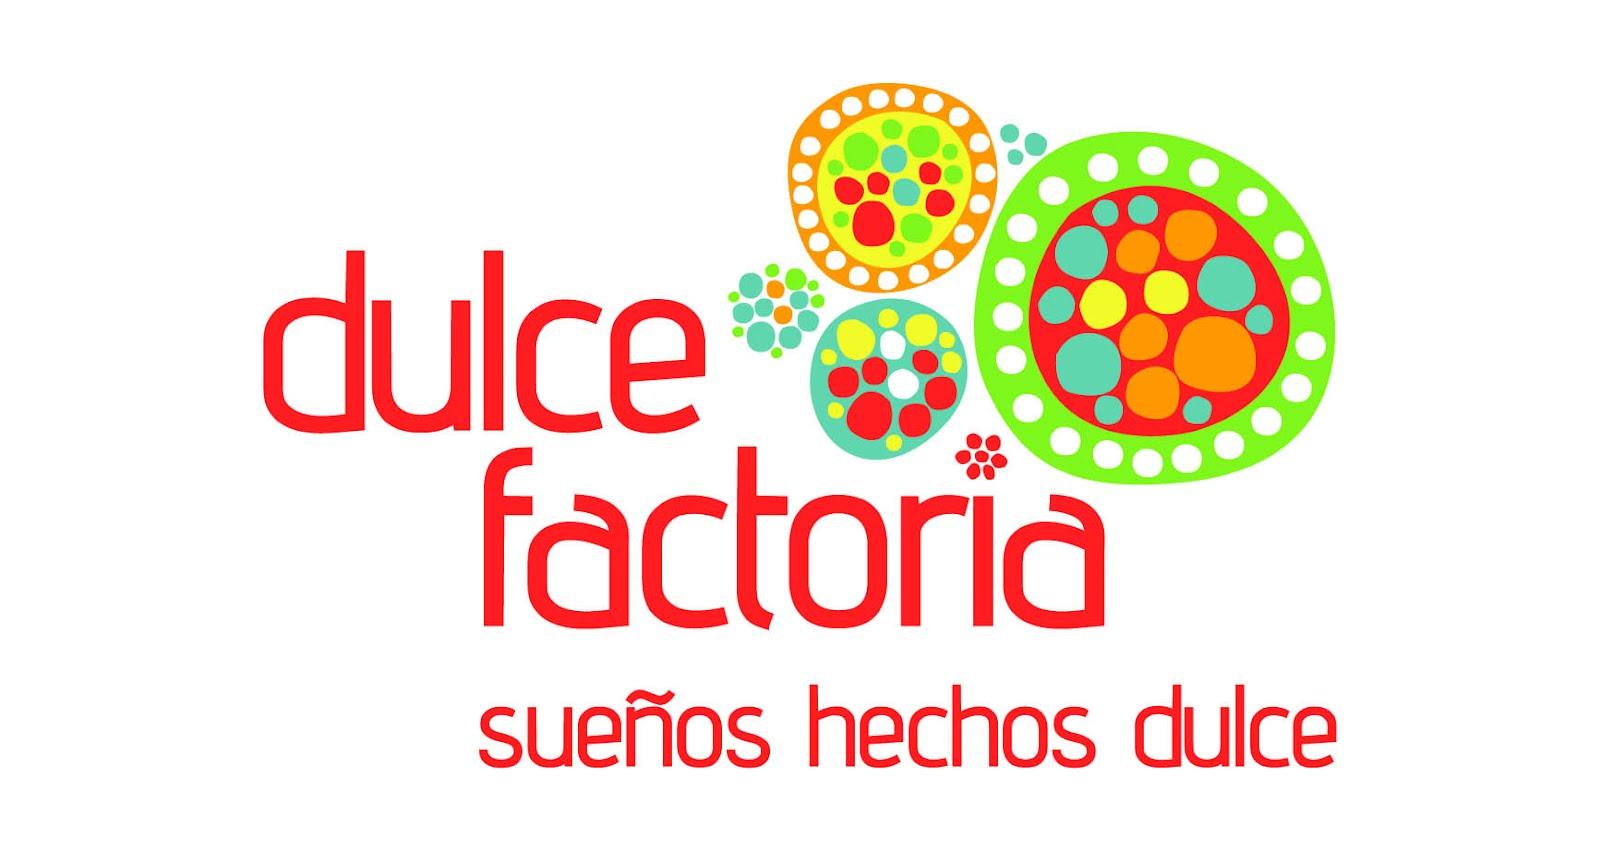 Dulce Factoría